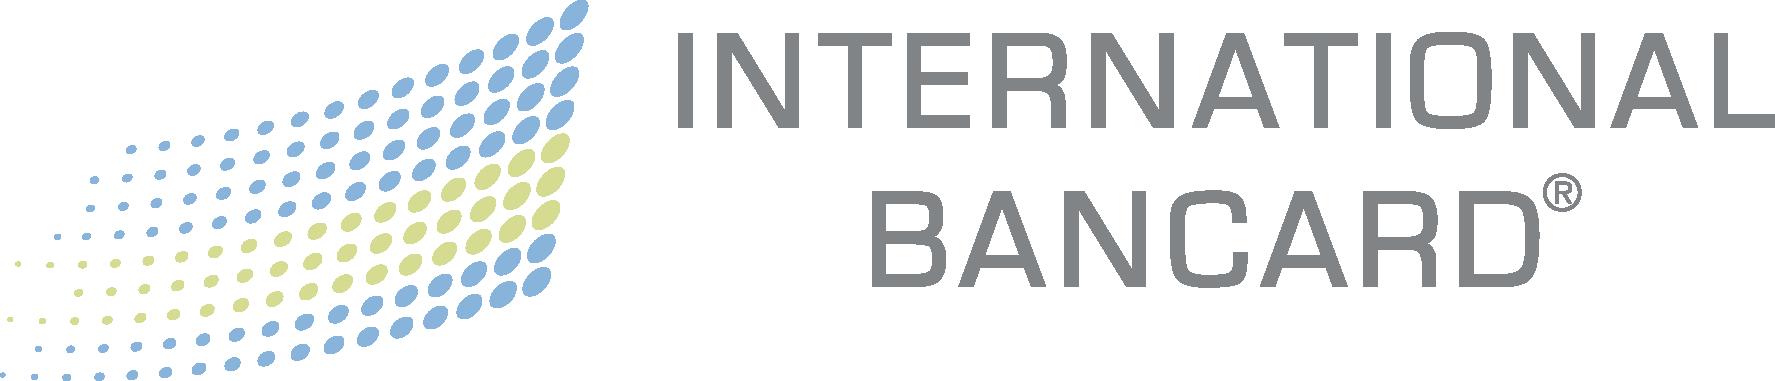 International_bancard_8.4.15.png